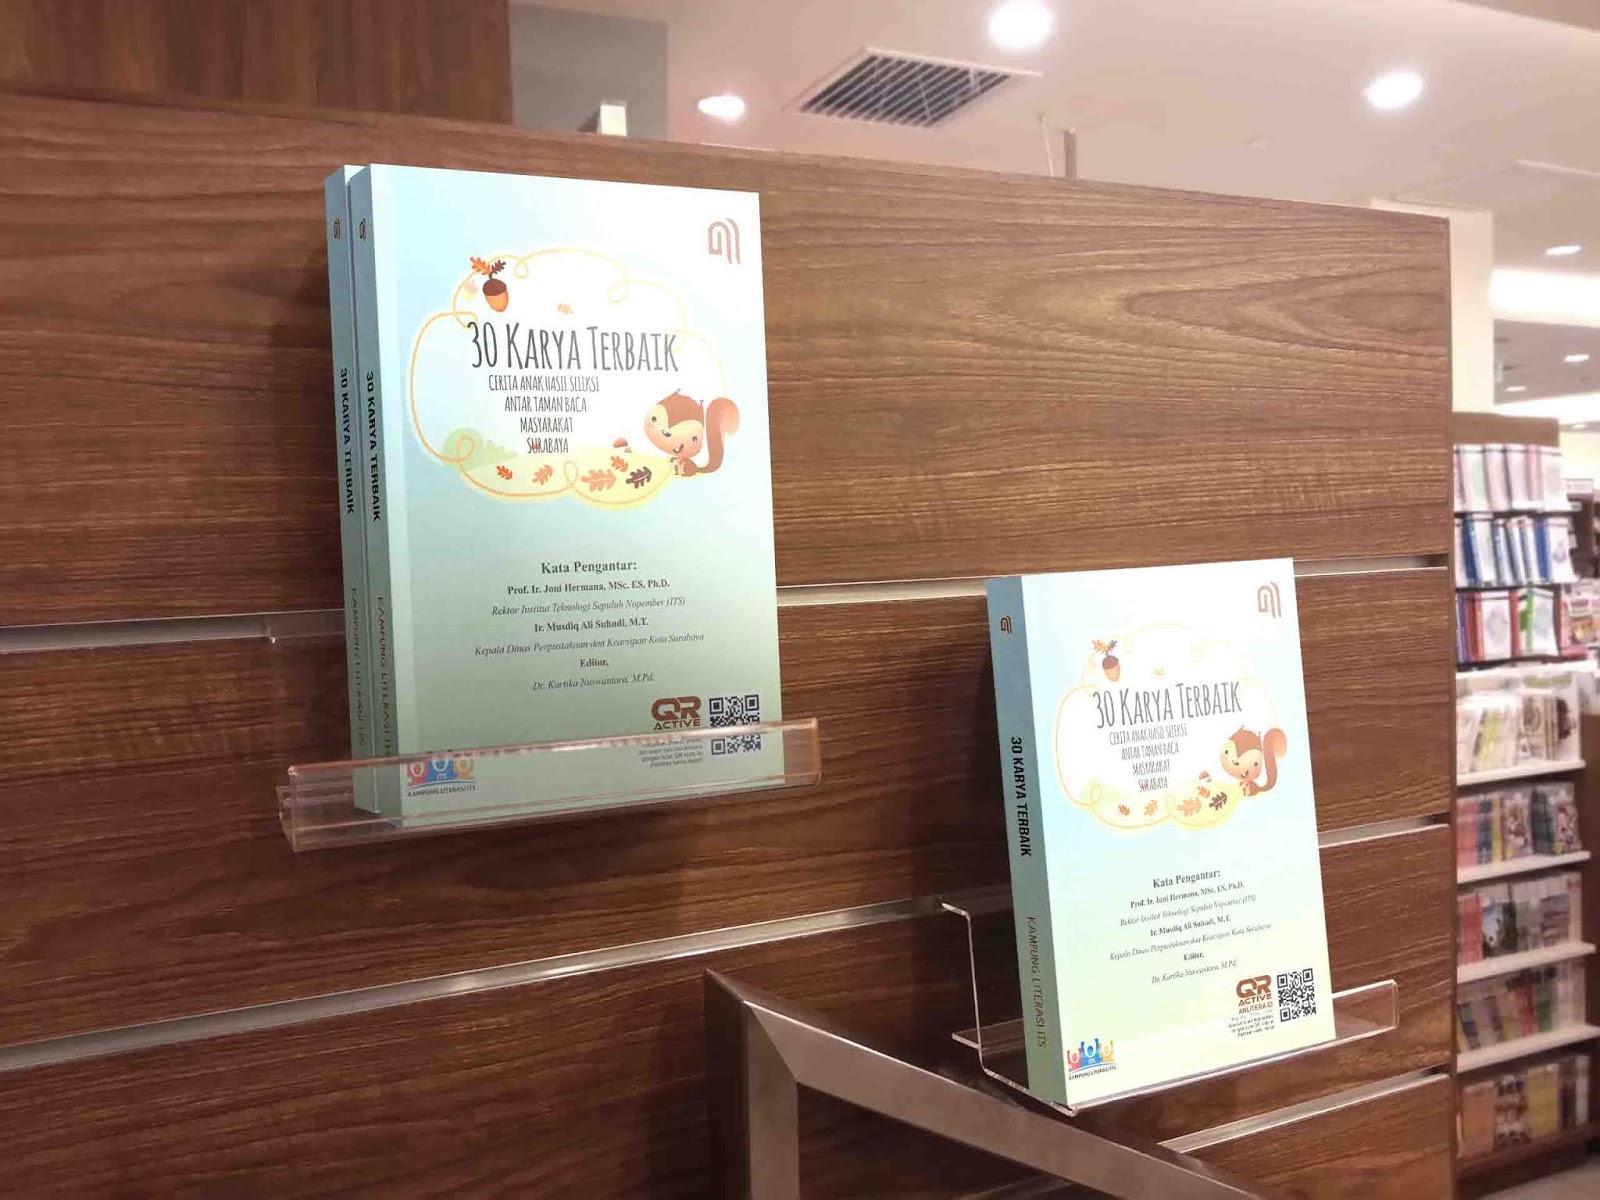 30 Karya Terbaik Cerita Anak TBM Surabaya